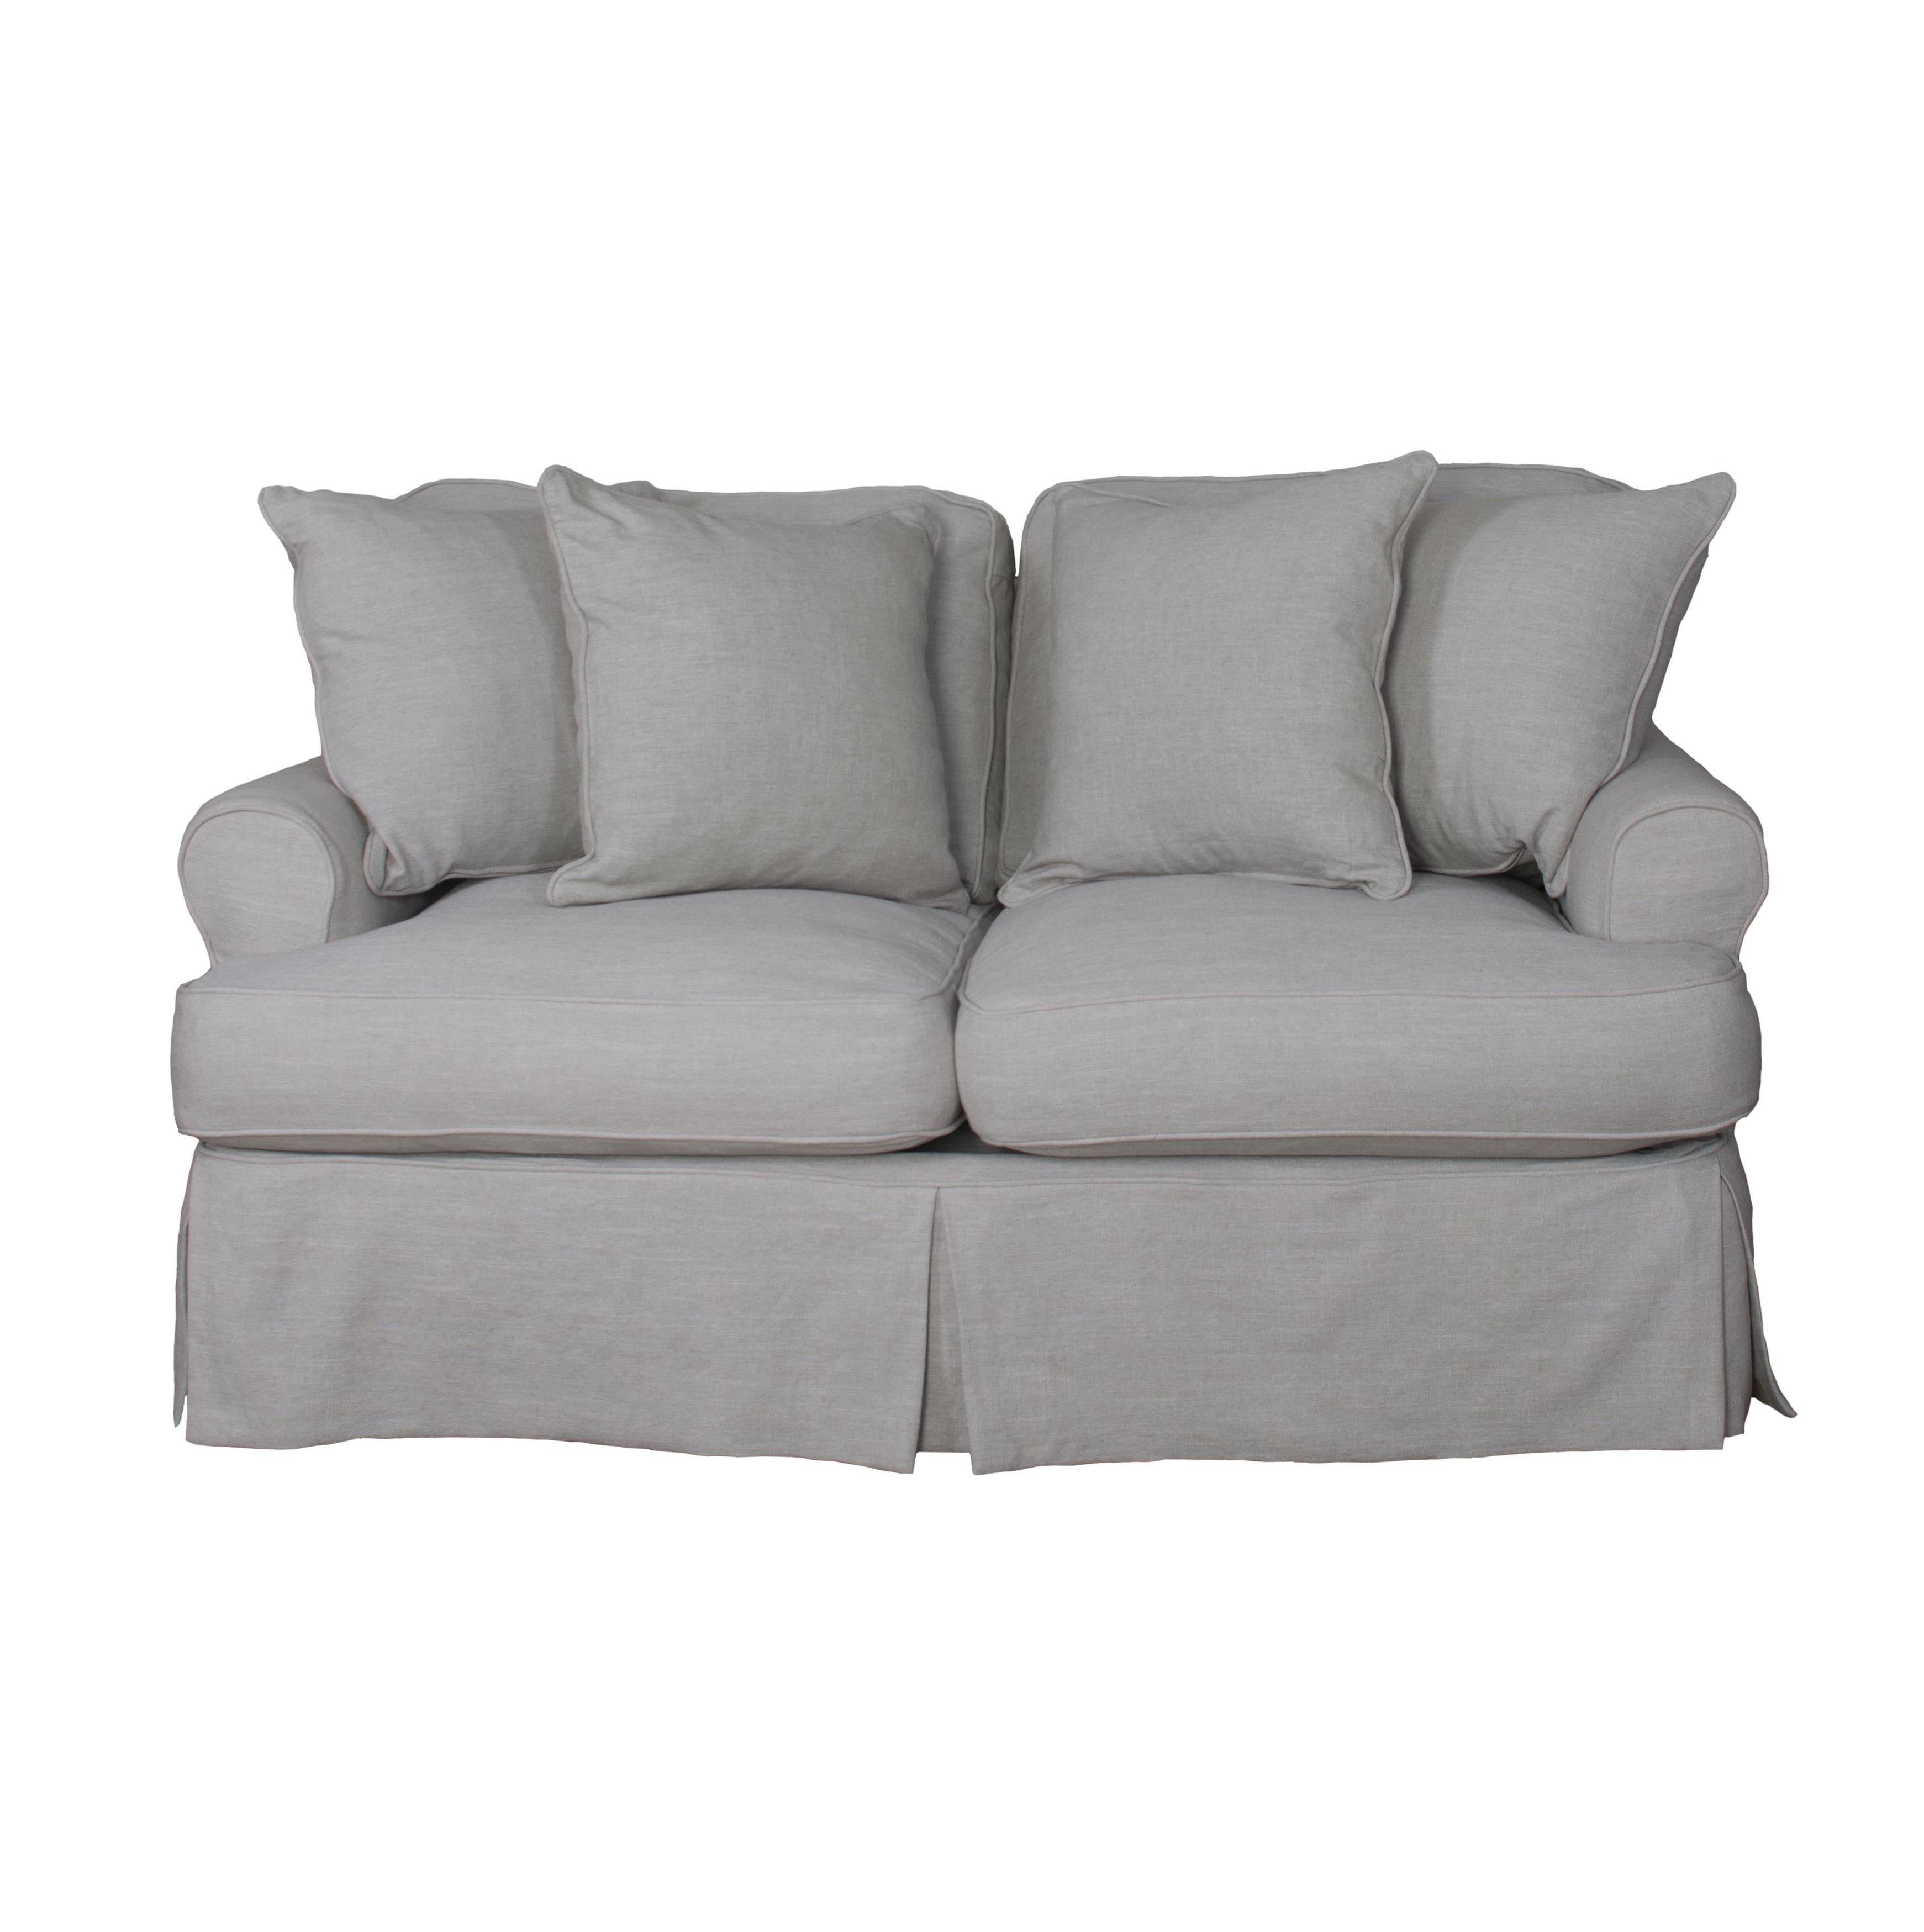 August Grove Callie Slipcovered Loveseat | Wayfair Pertaining To Callie Sofa Chairs (Image 1 of 25)